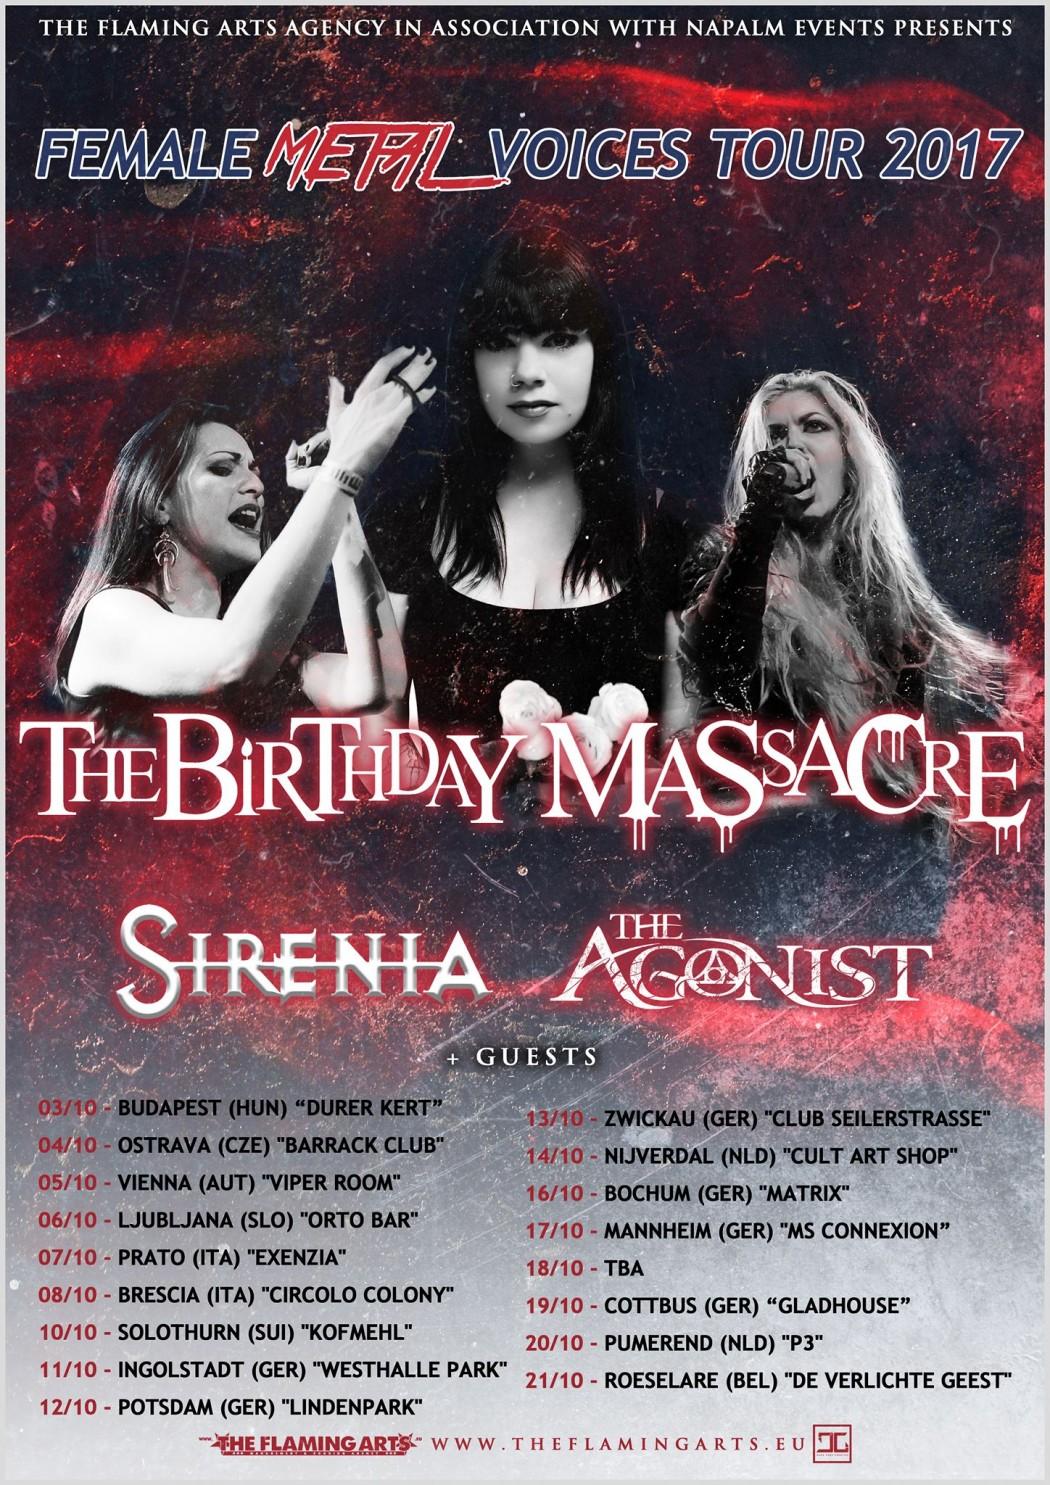 METAL FEMALE VOICES TOUR 2017 mit u. a. THE BIRTHDAY MASSACRE, SIRENIA und THE AGONIST